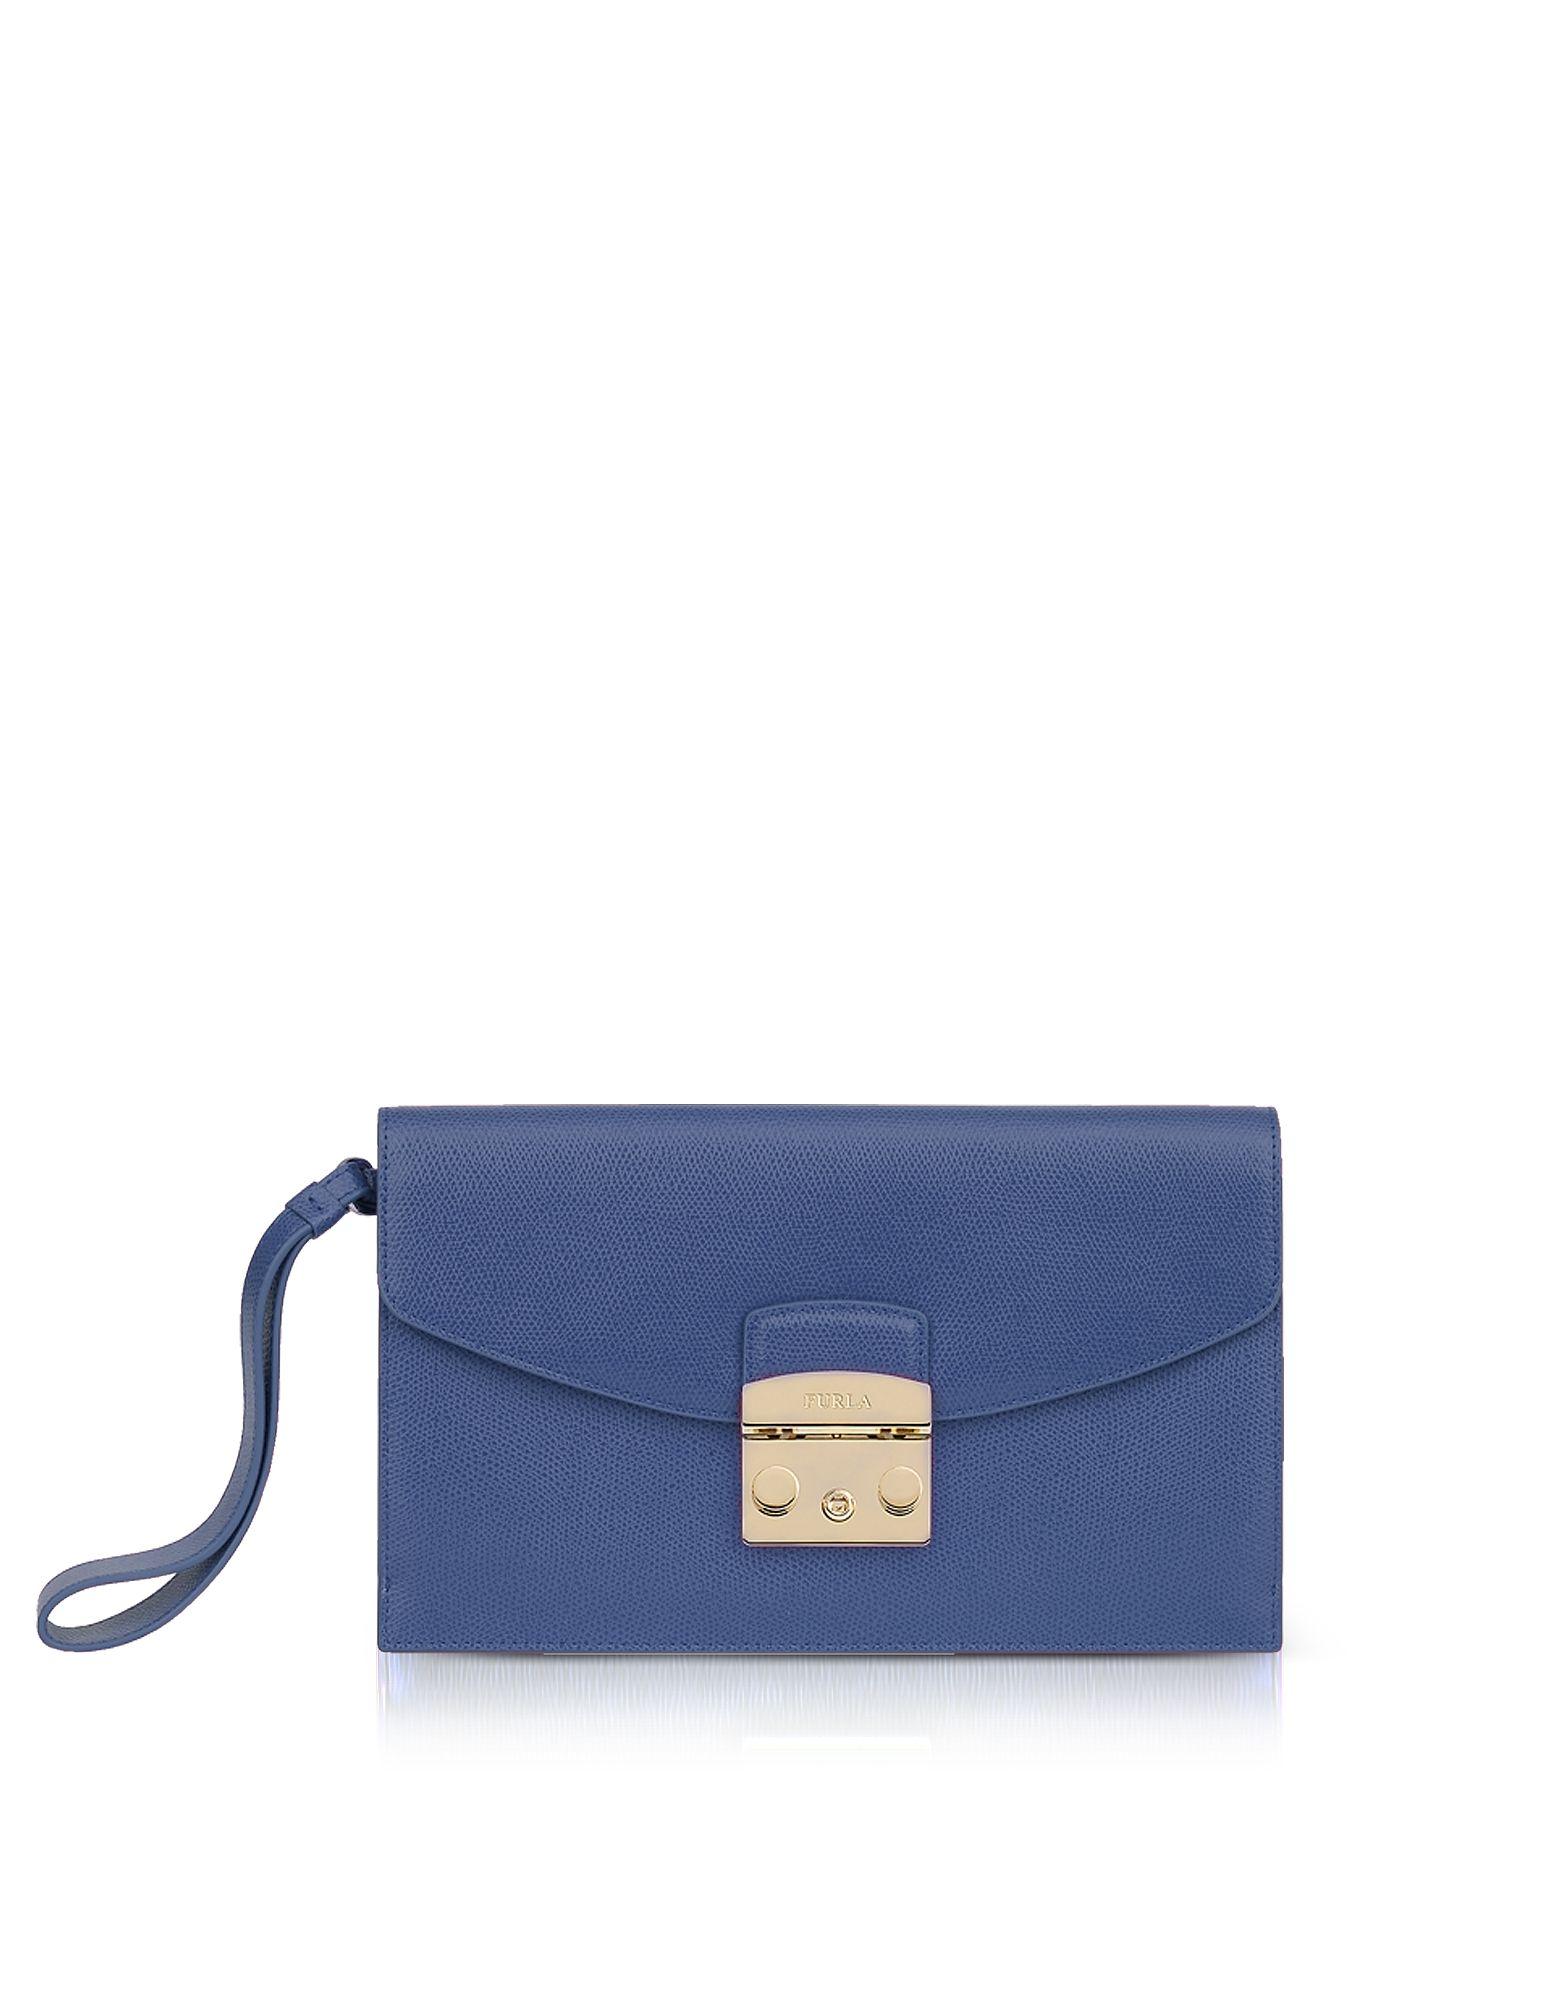 Shoulder Bag for Women On Sale, Peacock Blue, Leather, 2017, one size Furla